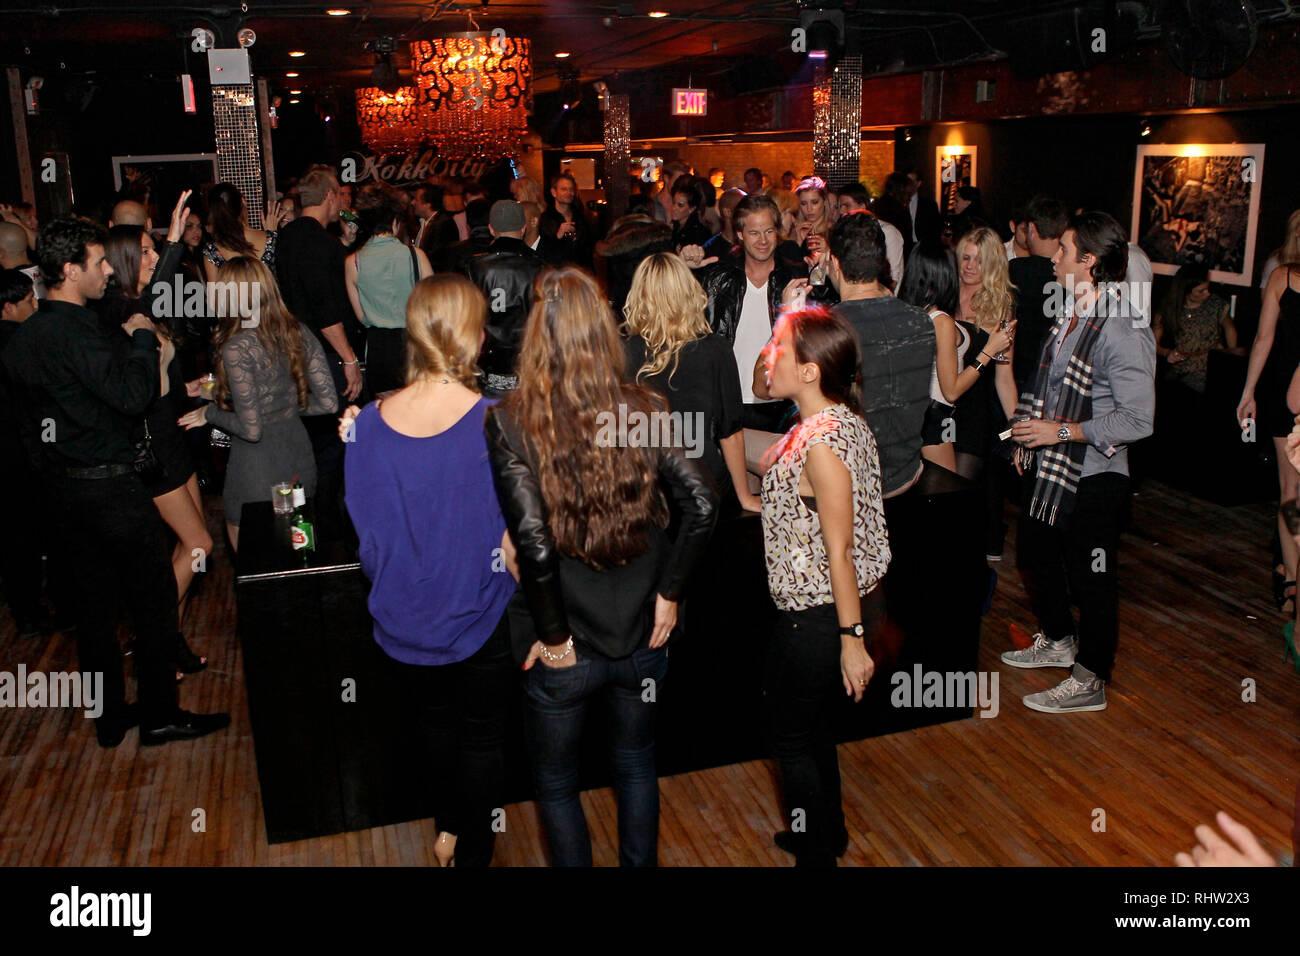 New York, USA. 05 Nov, 2011. Atmosphere at The Saturday, Nov 5, 2011 Grand Opening Of Rokk City Nightclub at Rokk City in New York, USA. Credit: Steve Mack/S.D. Mack Pictures/Alamy - Stock Image